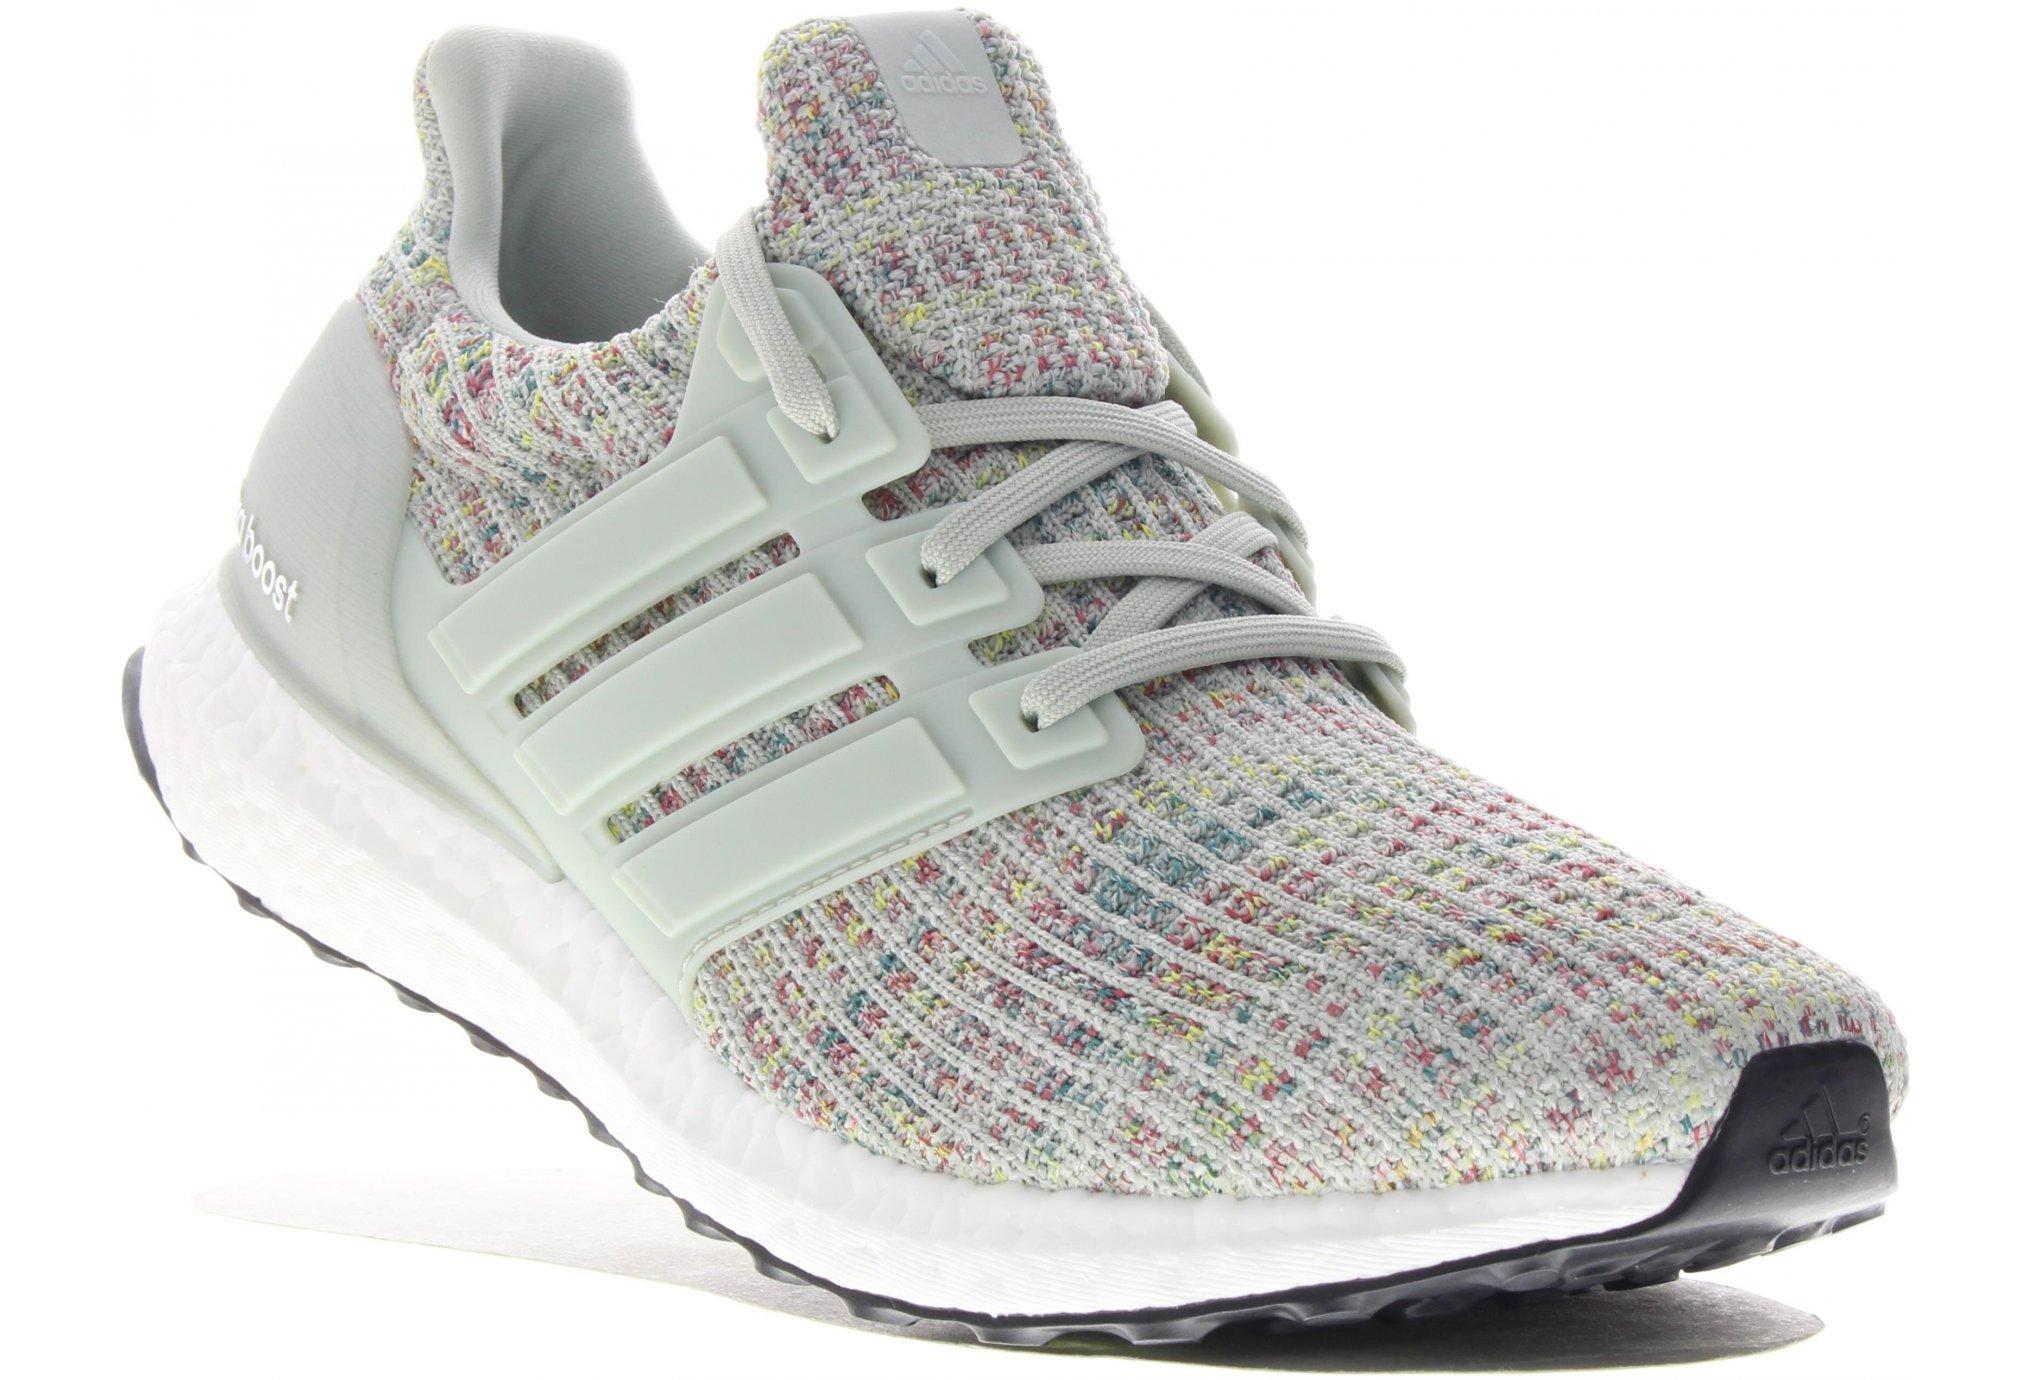 adidas UltraBOOST M Diététique Chaussures homme